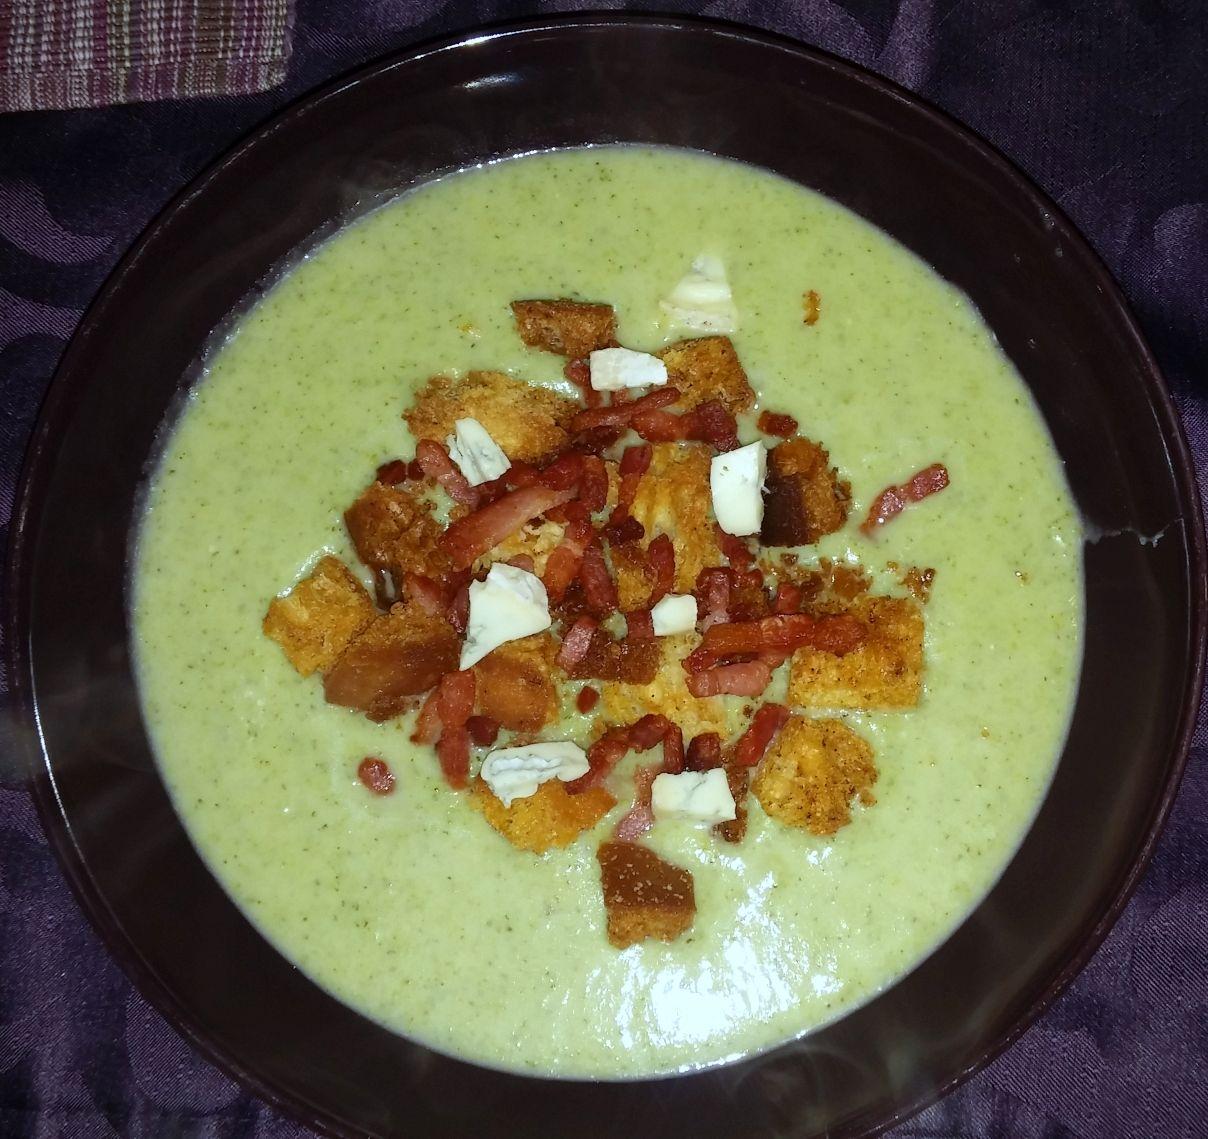 Broccolisoep met blauwe kaas | Recept